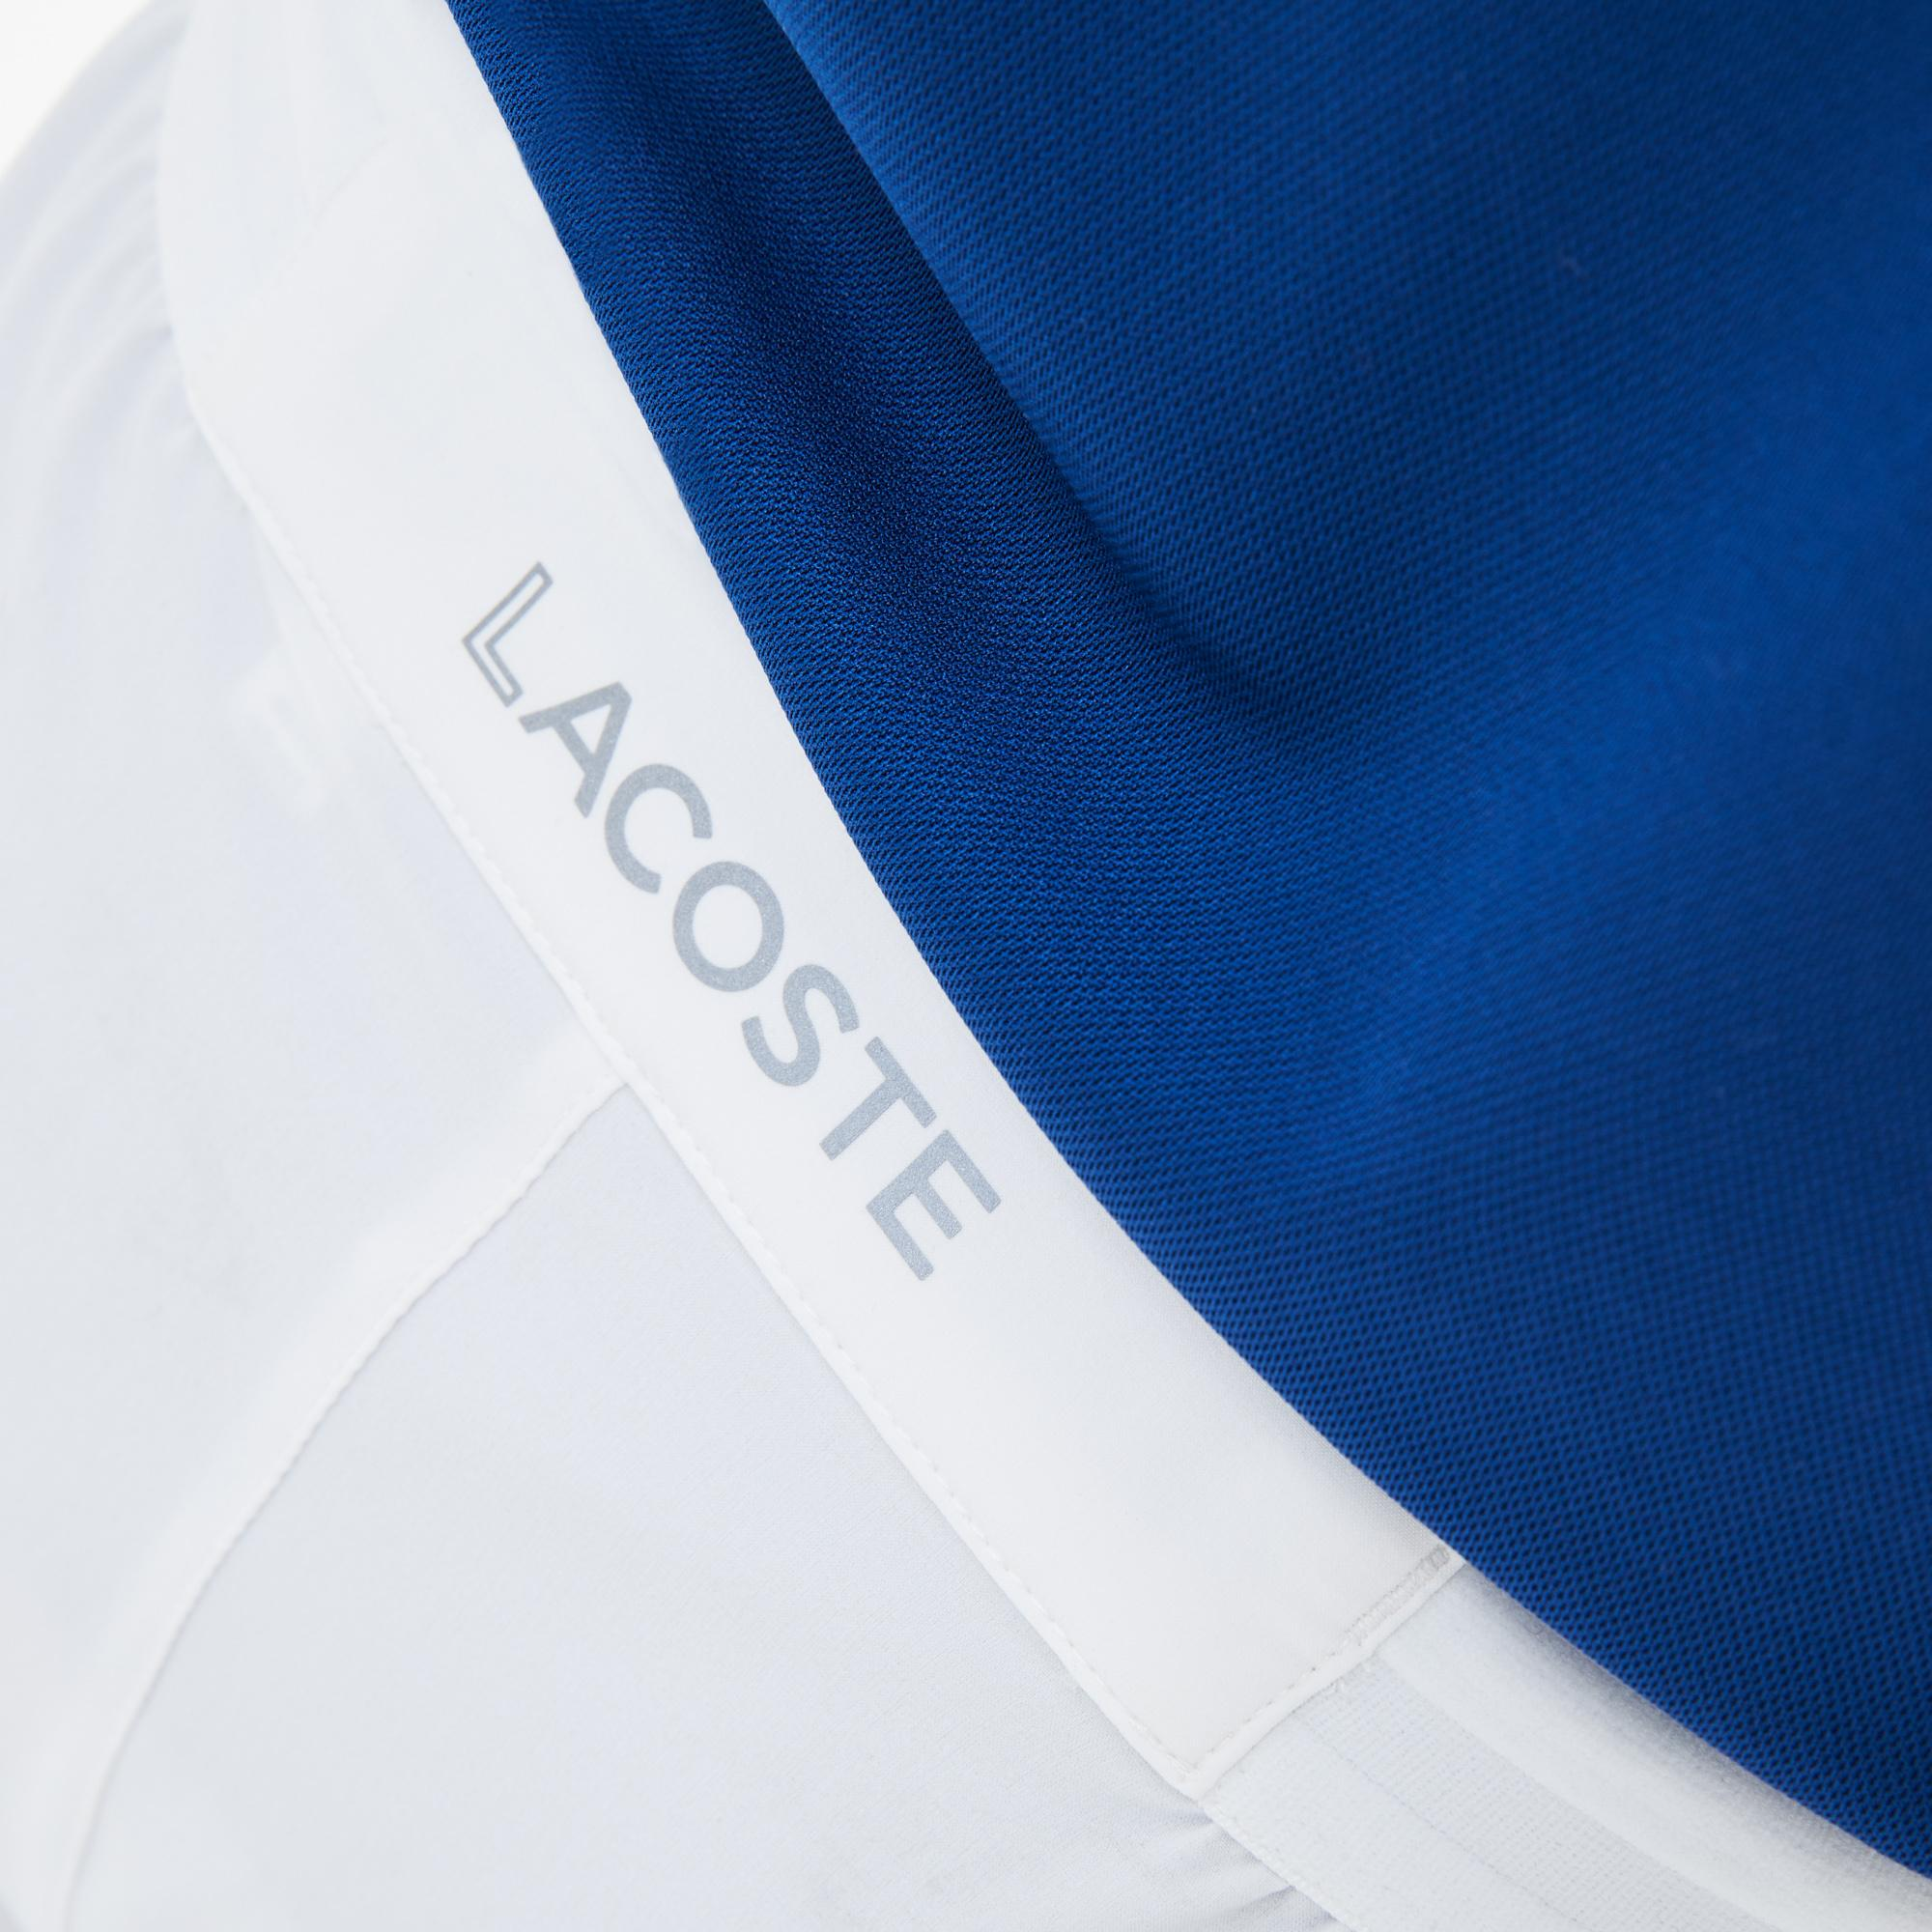 ae9331547 Lacoste Mens Djokovic Stretch Woven Shorts - White - Tennisnuts.com